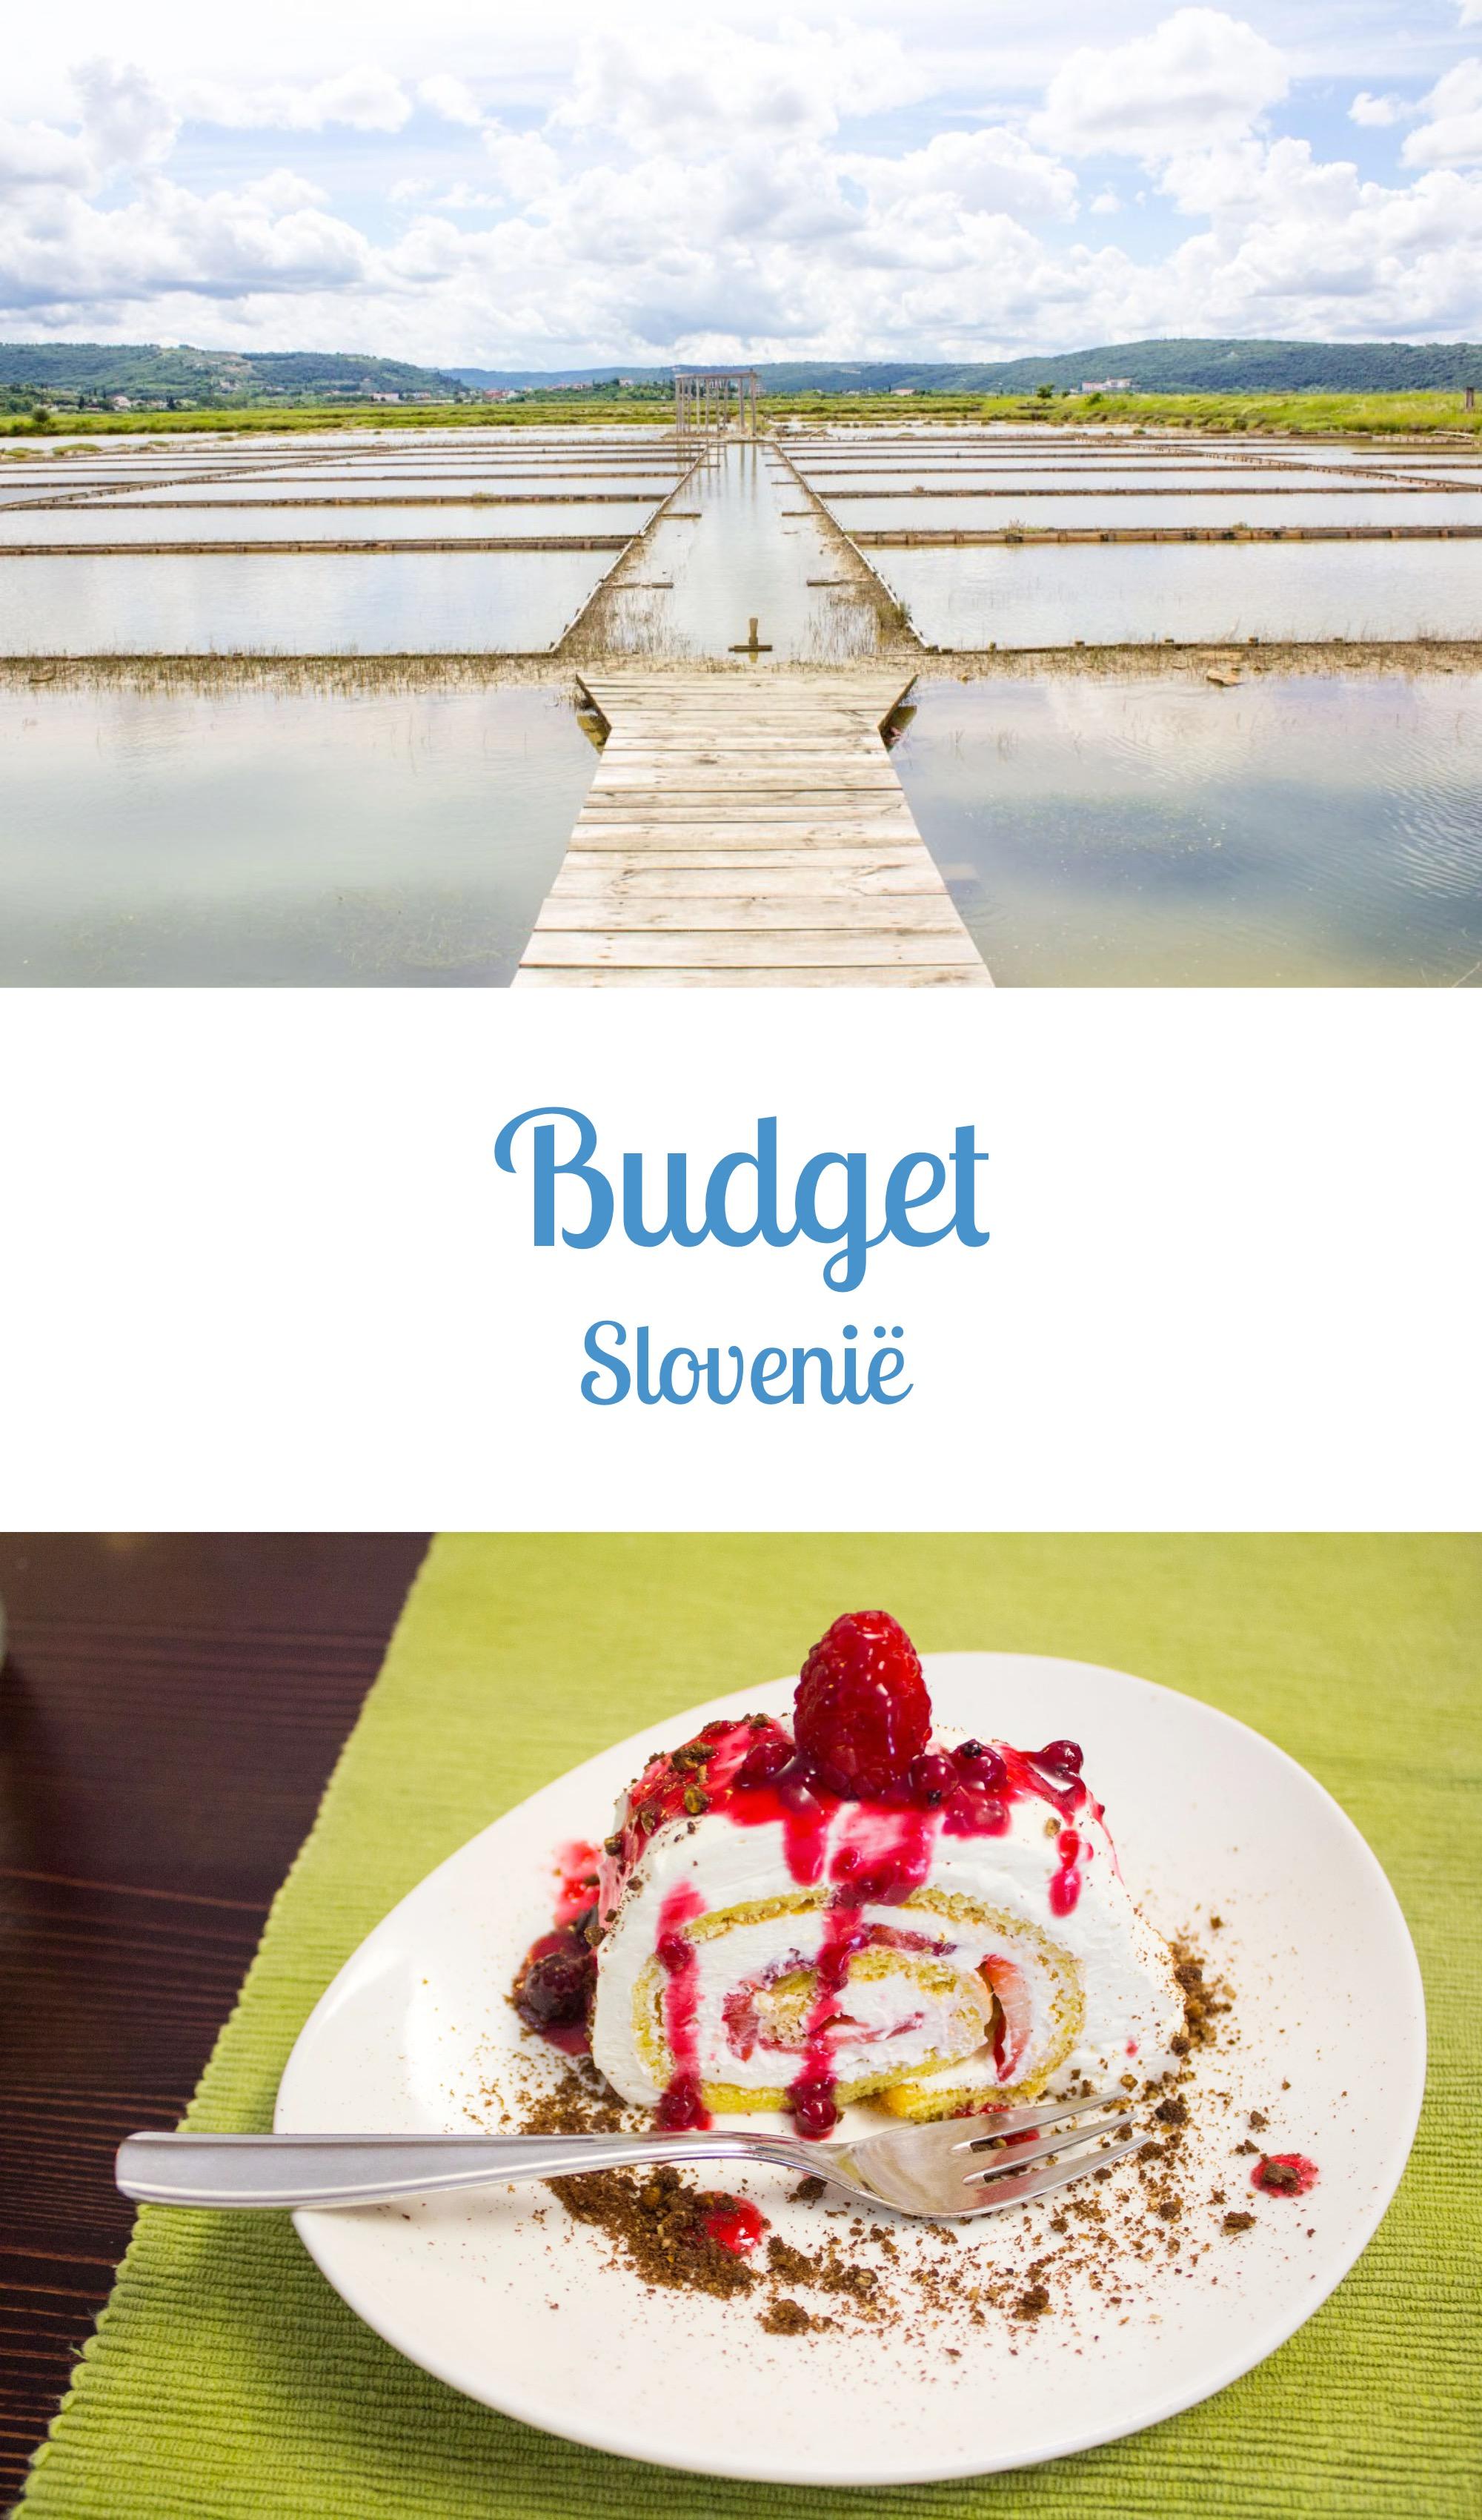 Slovenië: Budget